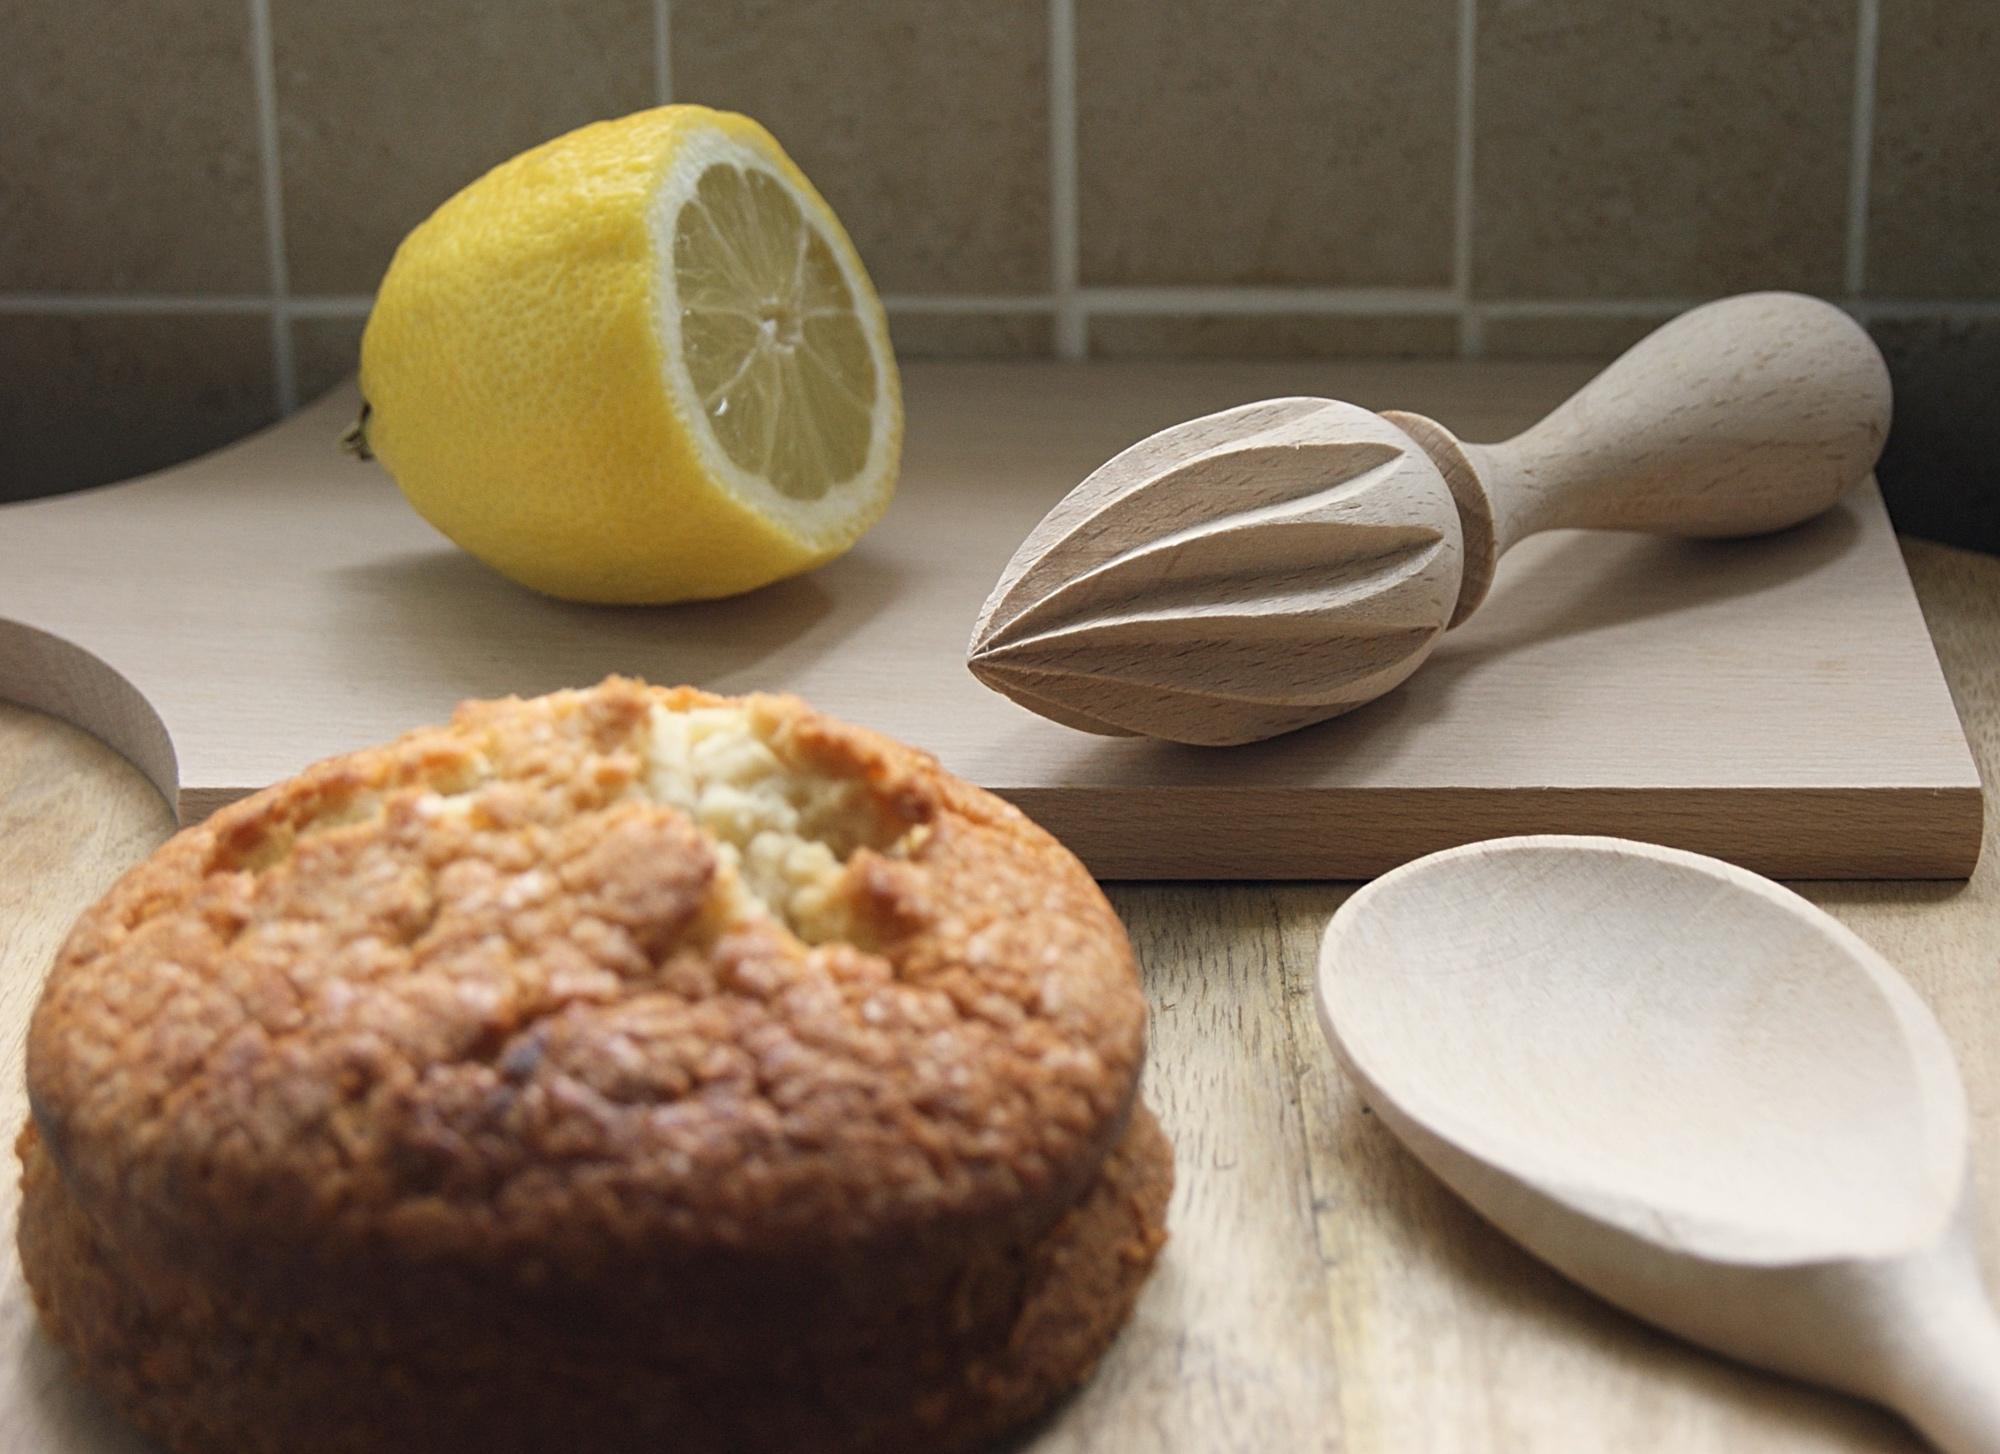 Lemons & Lemonade - Home of La Juniper